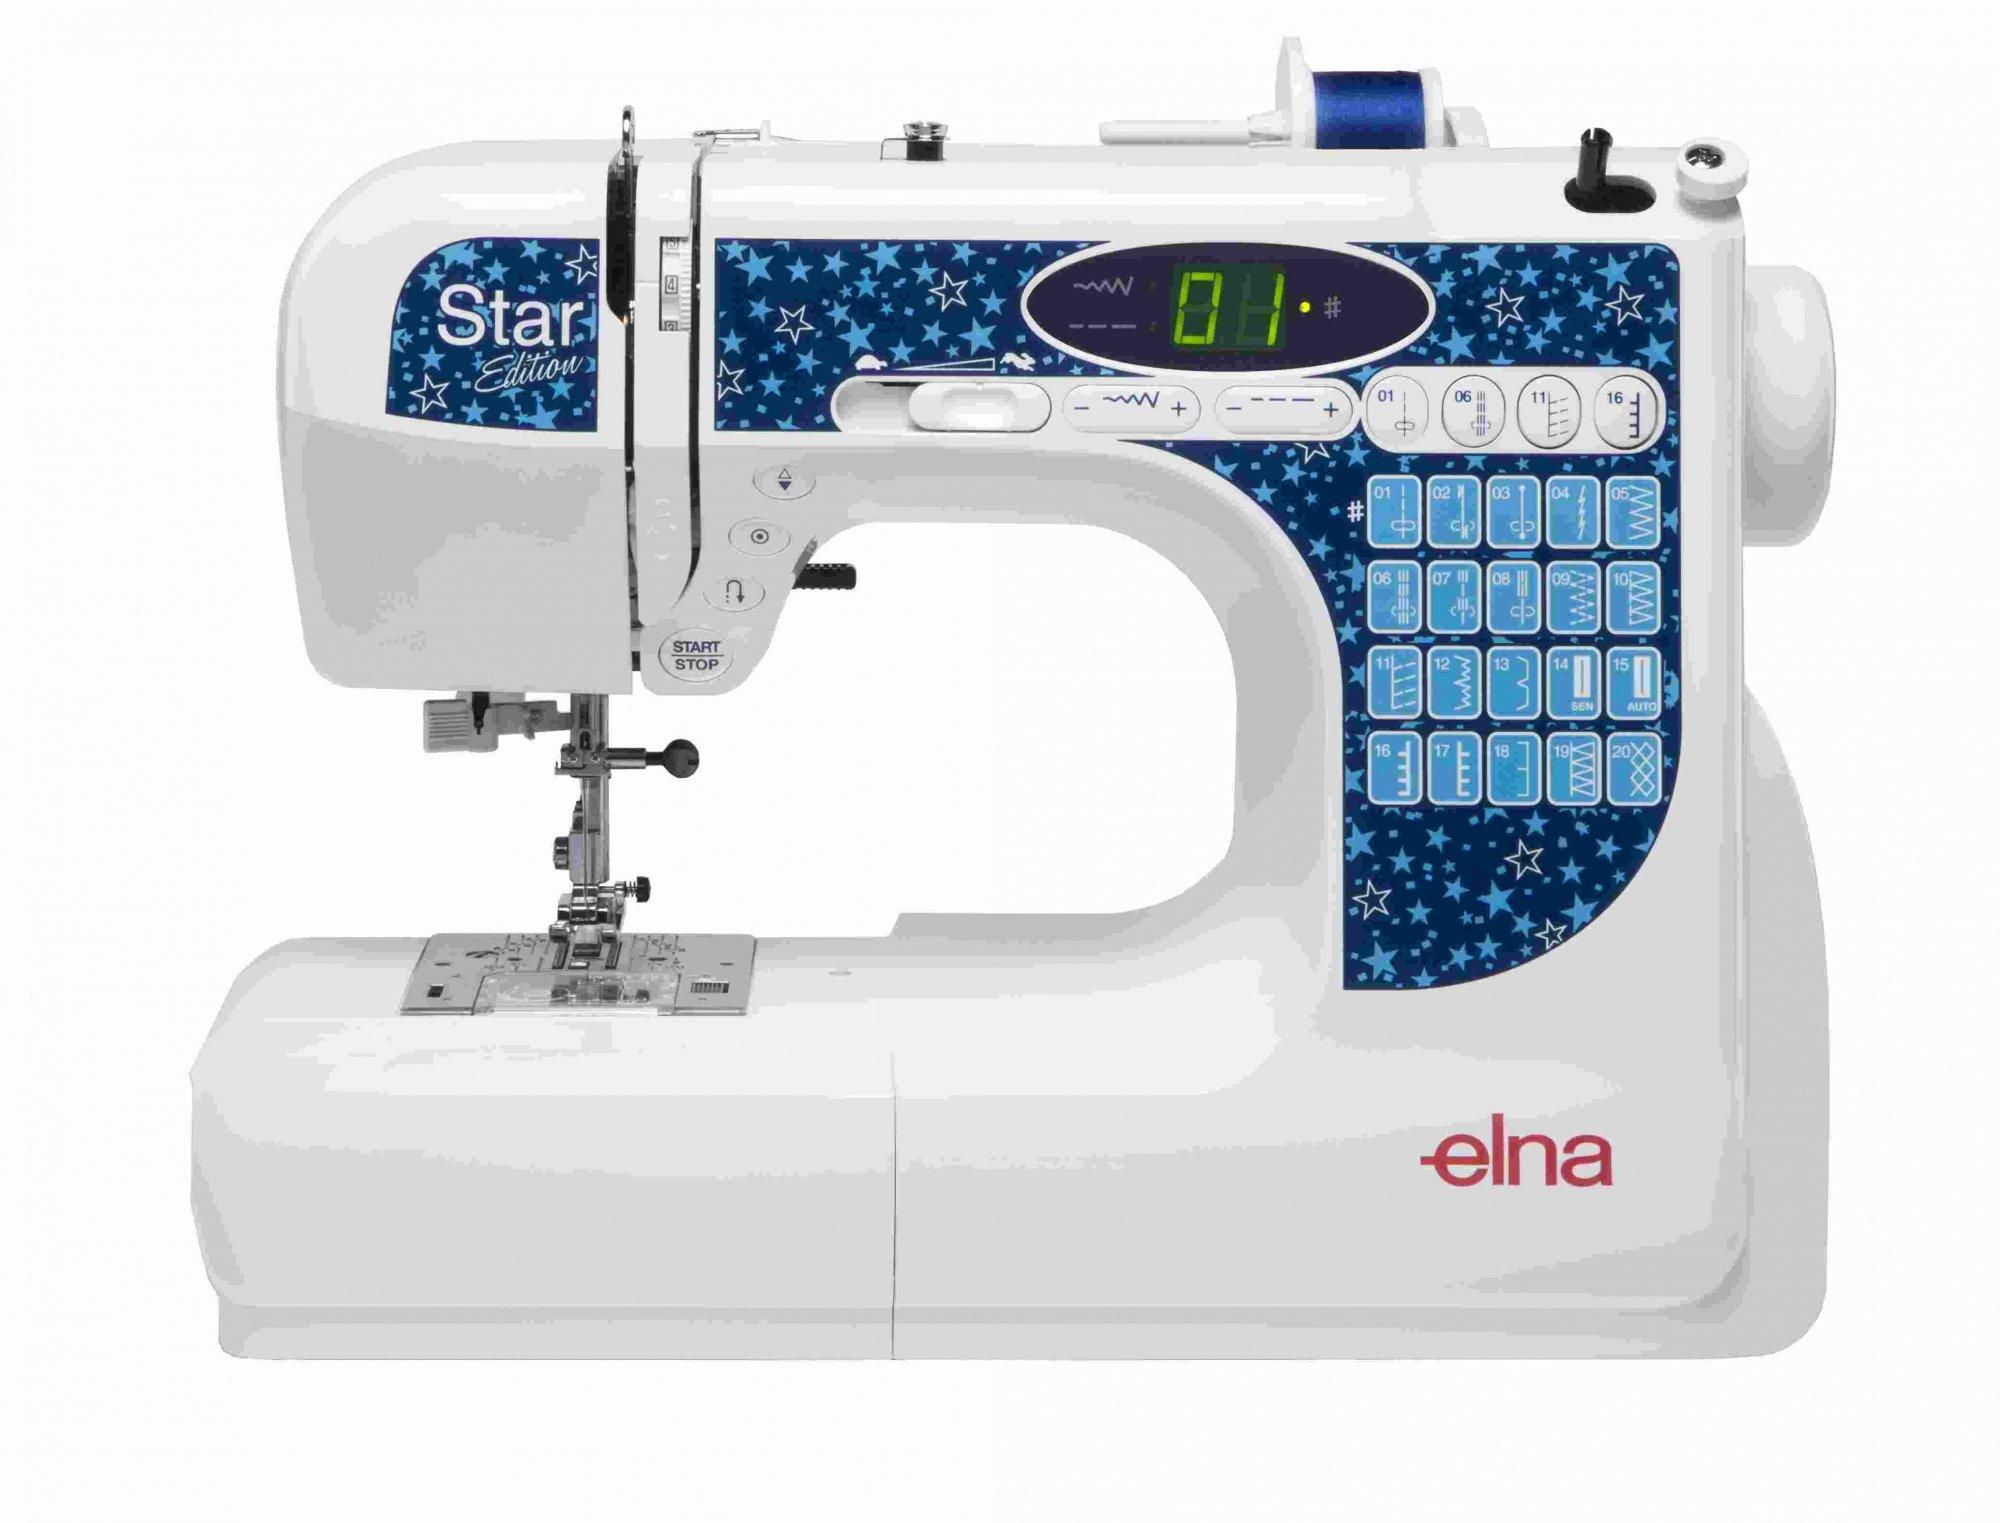 MACHINE-ELNA-STAR EDITION